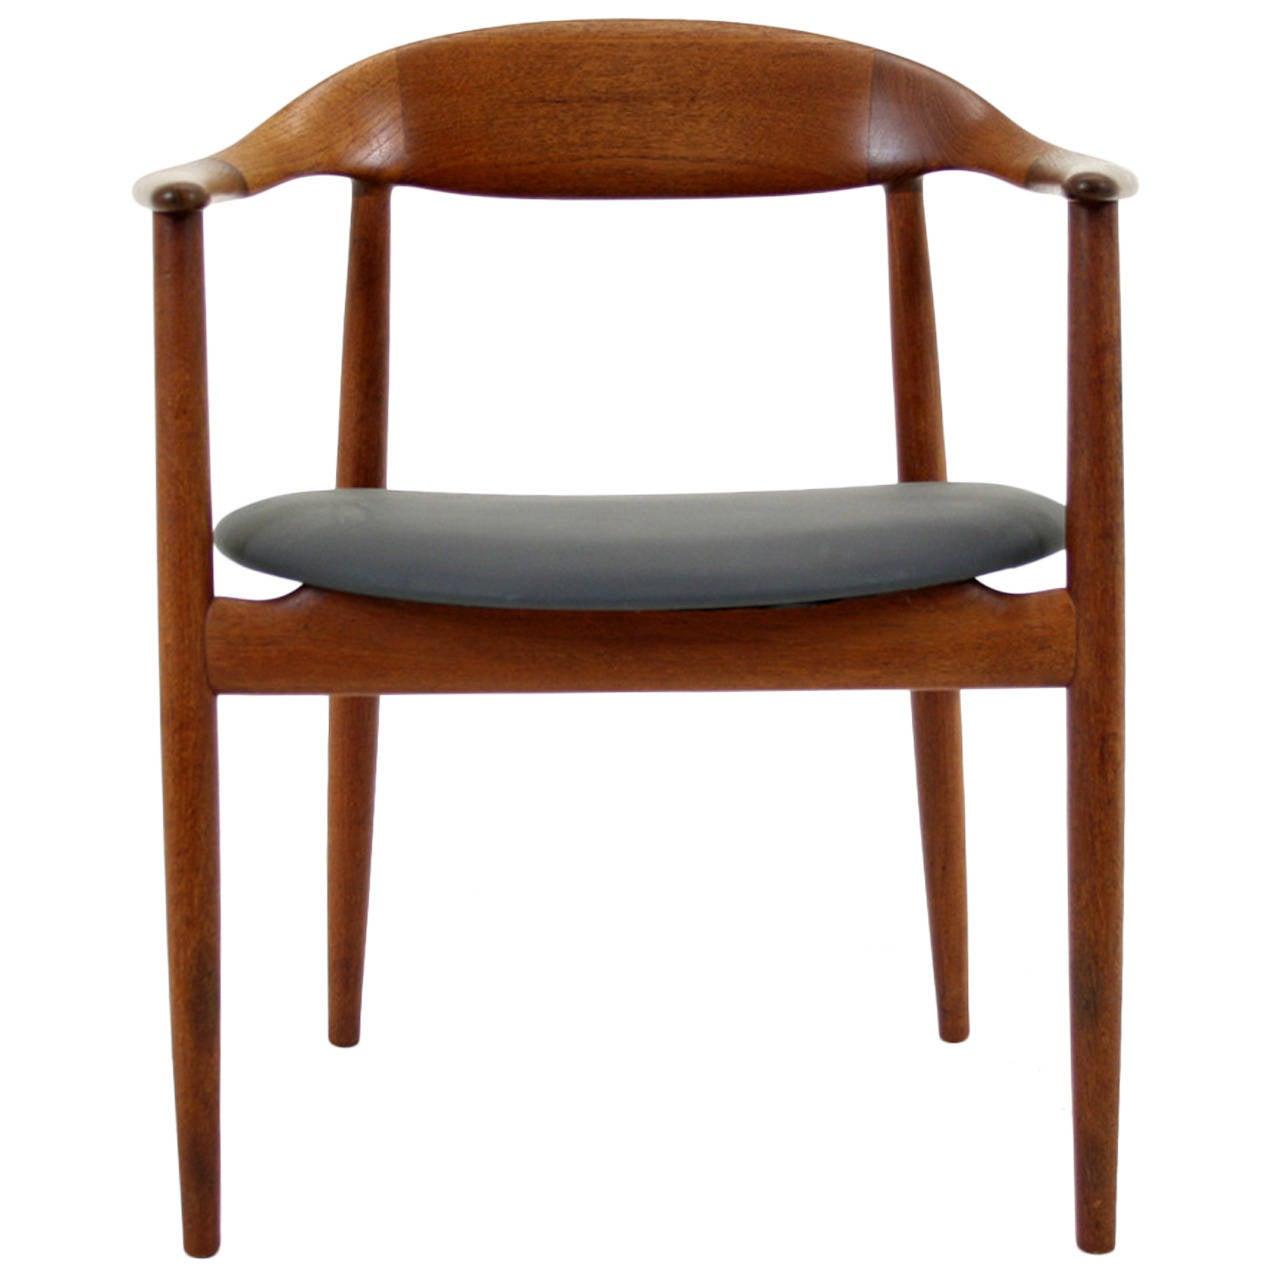 Danish Mid Century Modern Teak Arm Chair By Kurt Ostervig